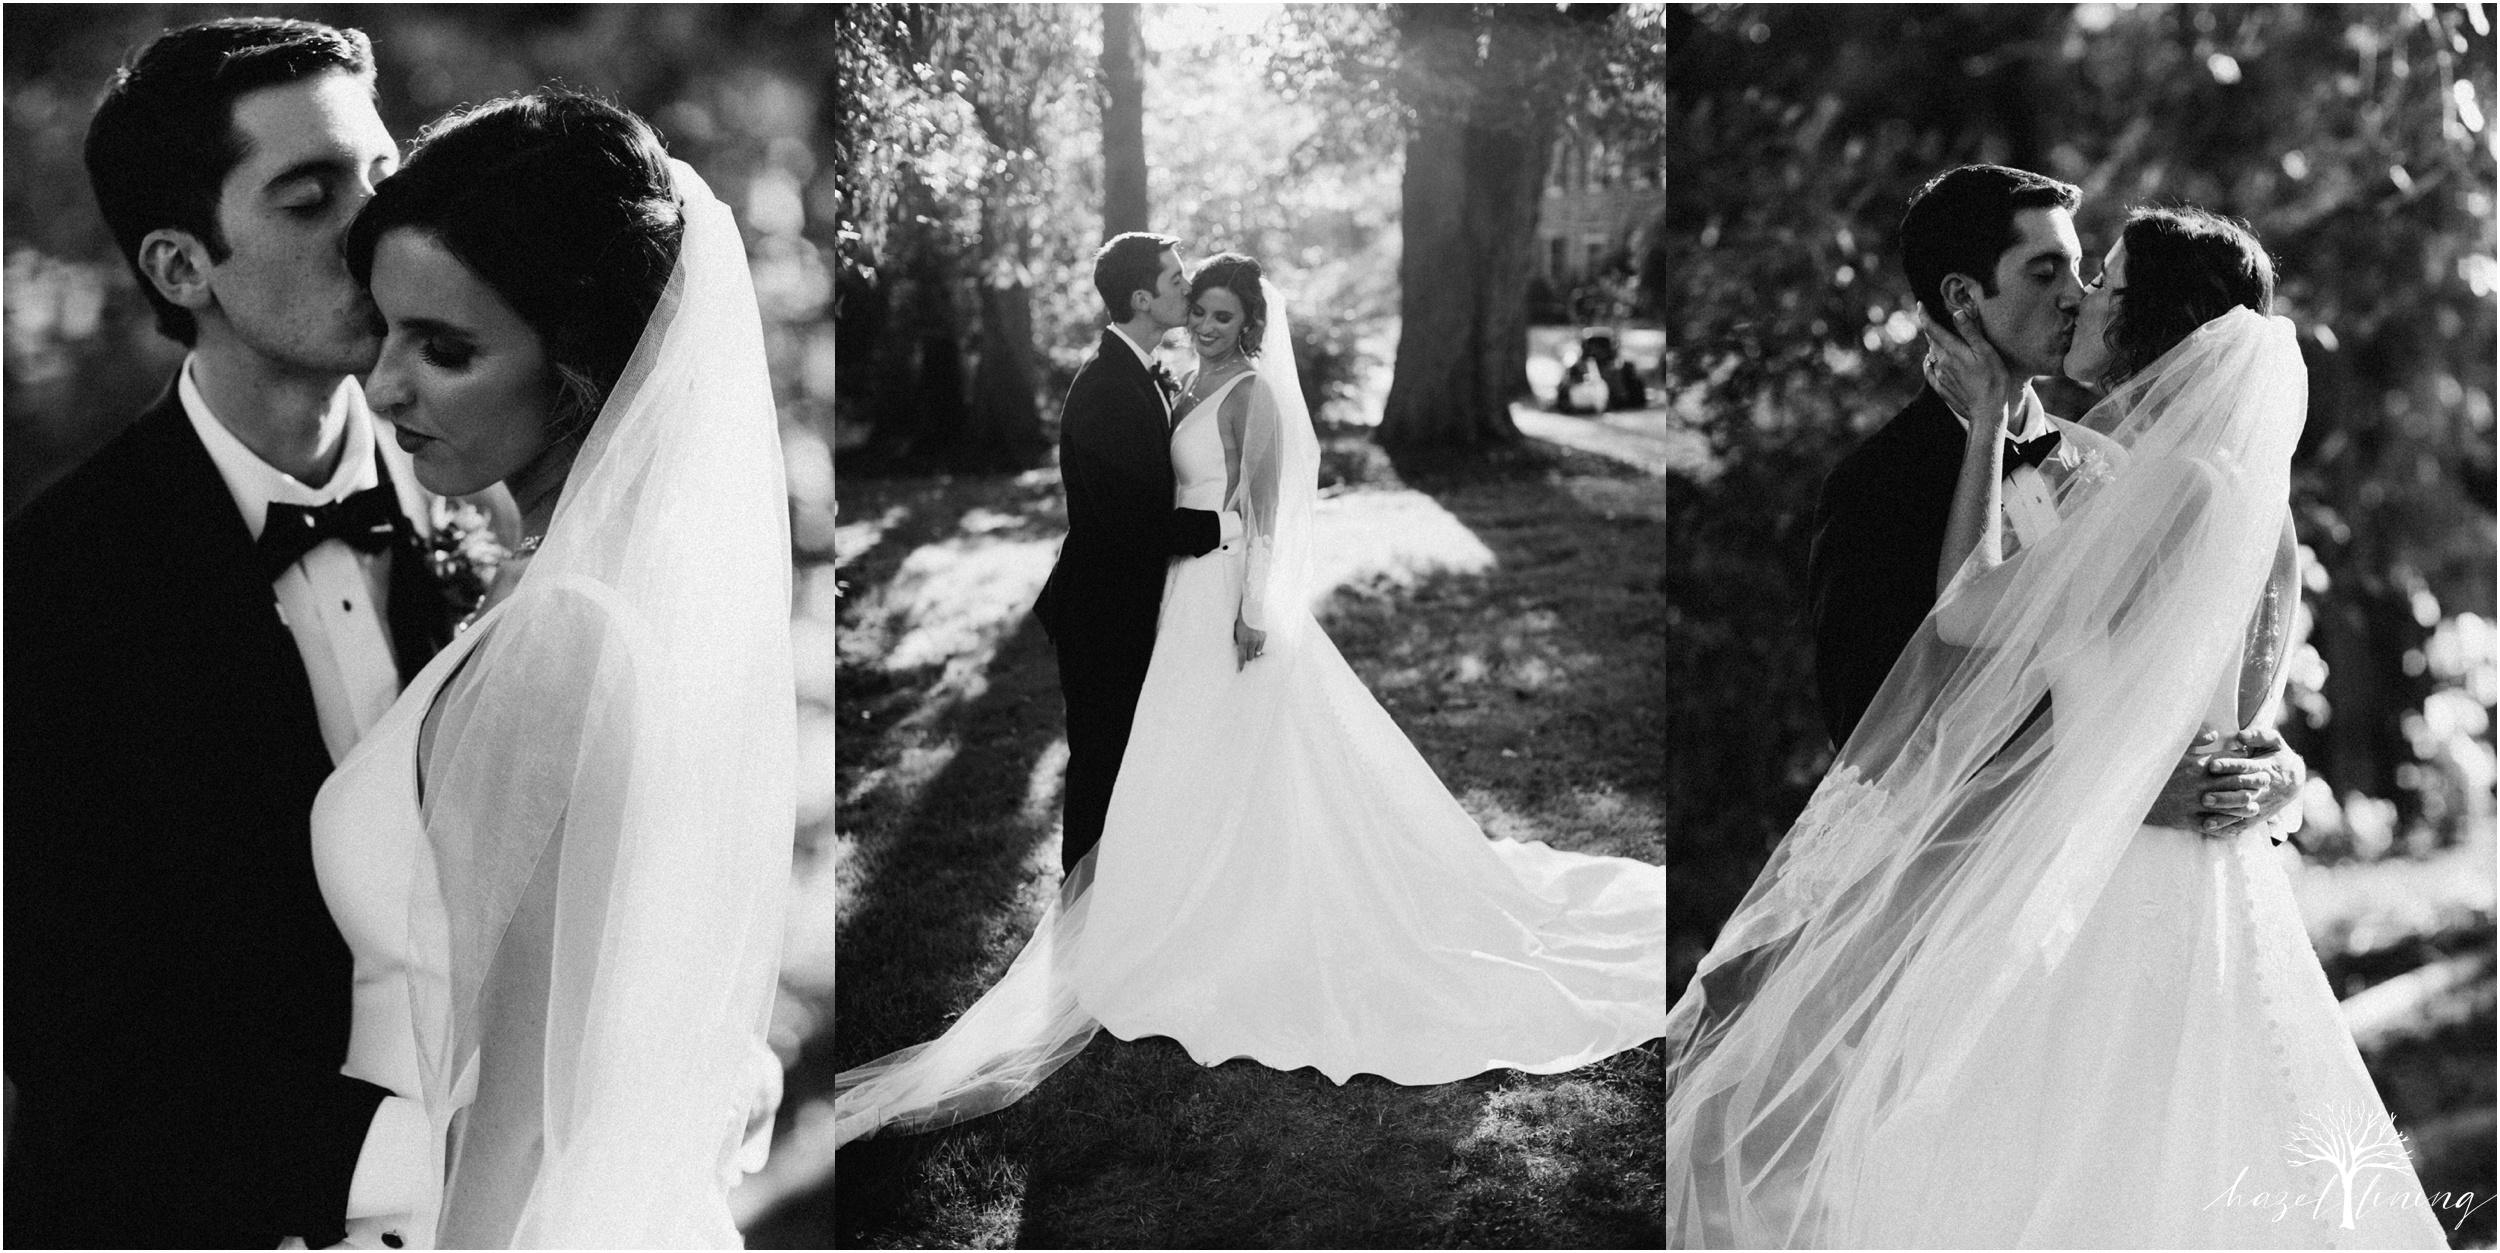 maureen-hepner-anthony-giordano-rose-bank-winery-newtow-pennsylvania-luxury-summer-wedding-hazel-lining-photography-destination-elopement-wedding-engagement-photography_0119.jpg